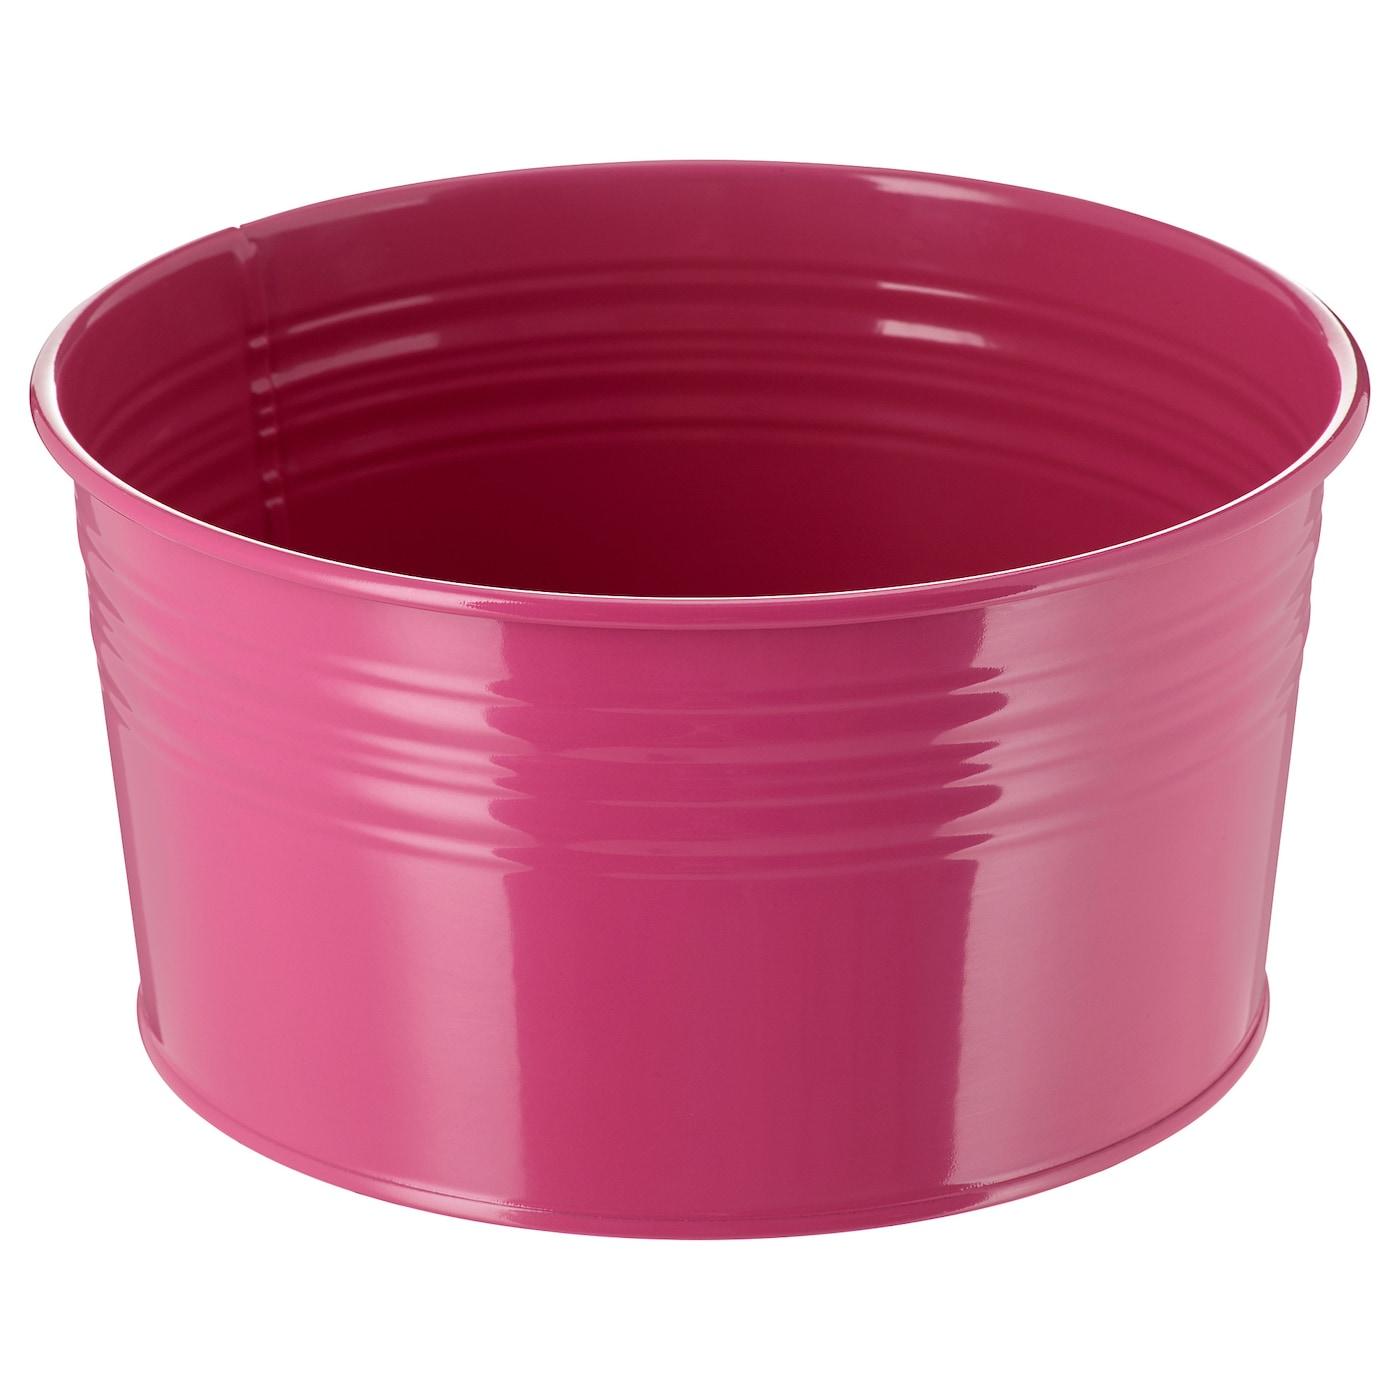 socker cache pot int rieur ext rieur rose ikea. Black Bedroom Furniture Sets. Home Design Ideas